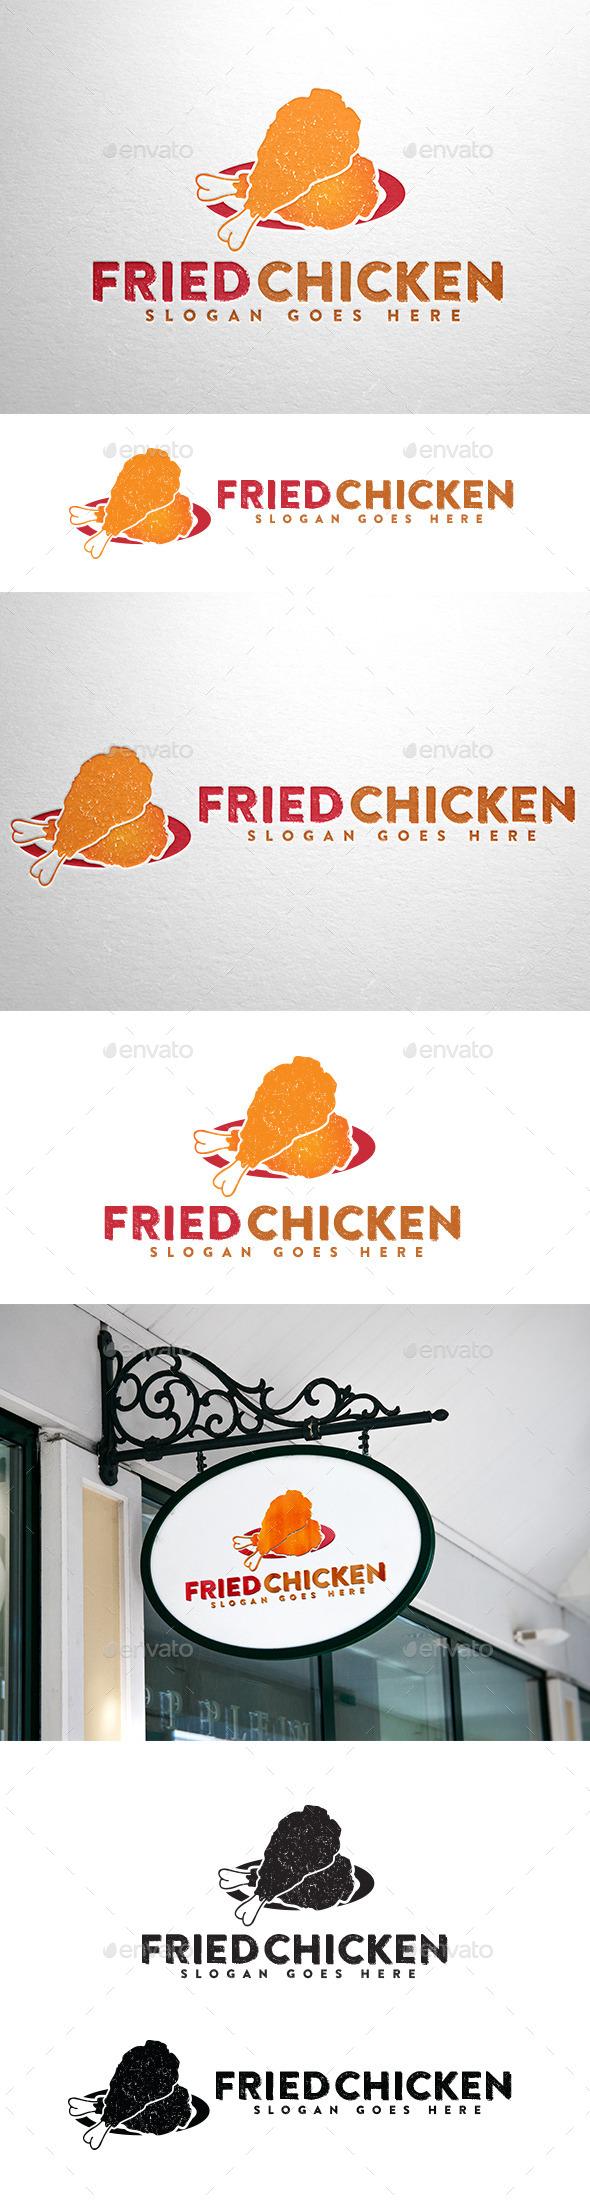 GraphicRiver Fried Chicken Logo 10697949